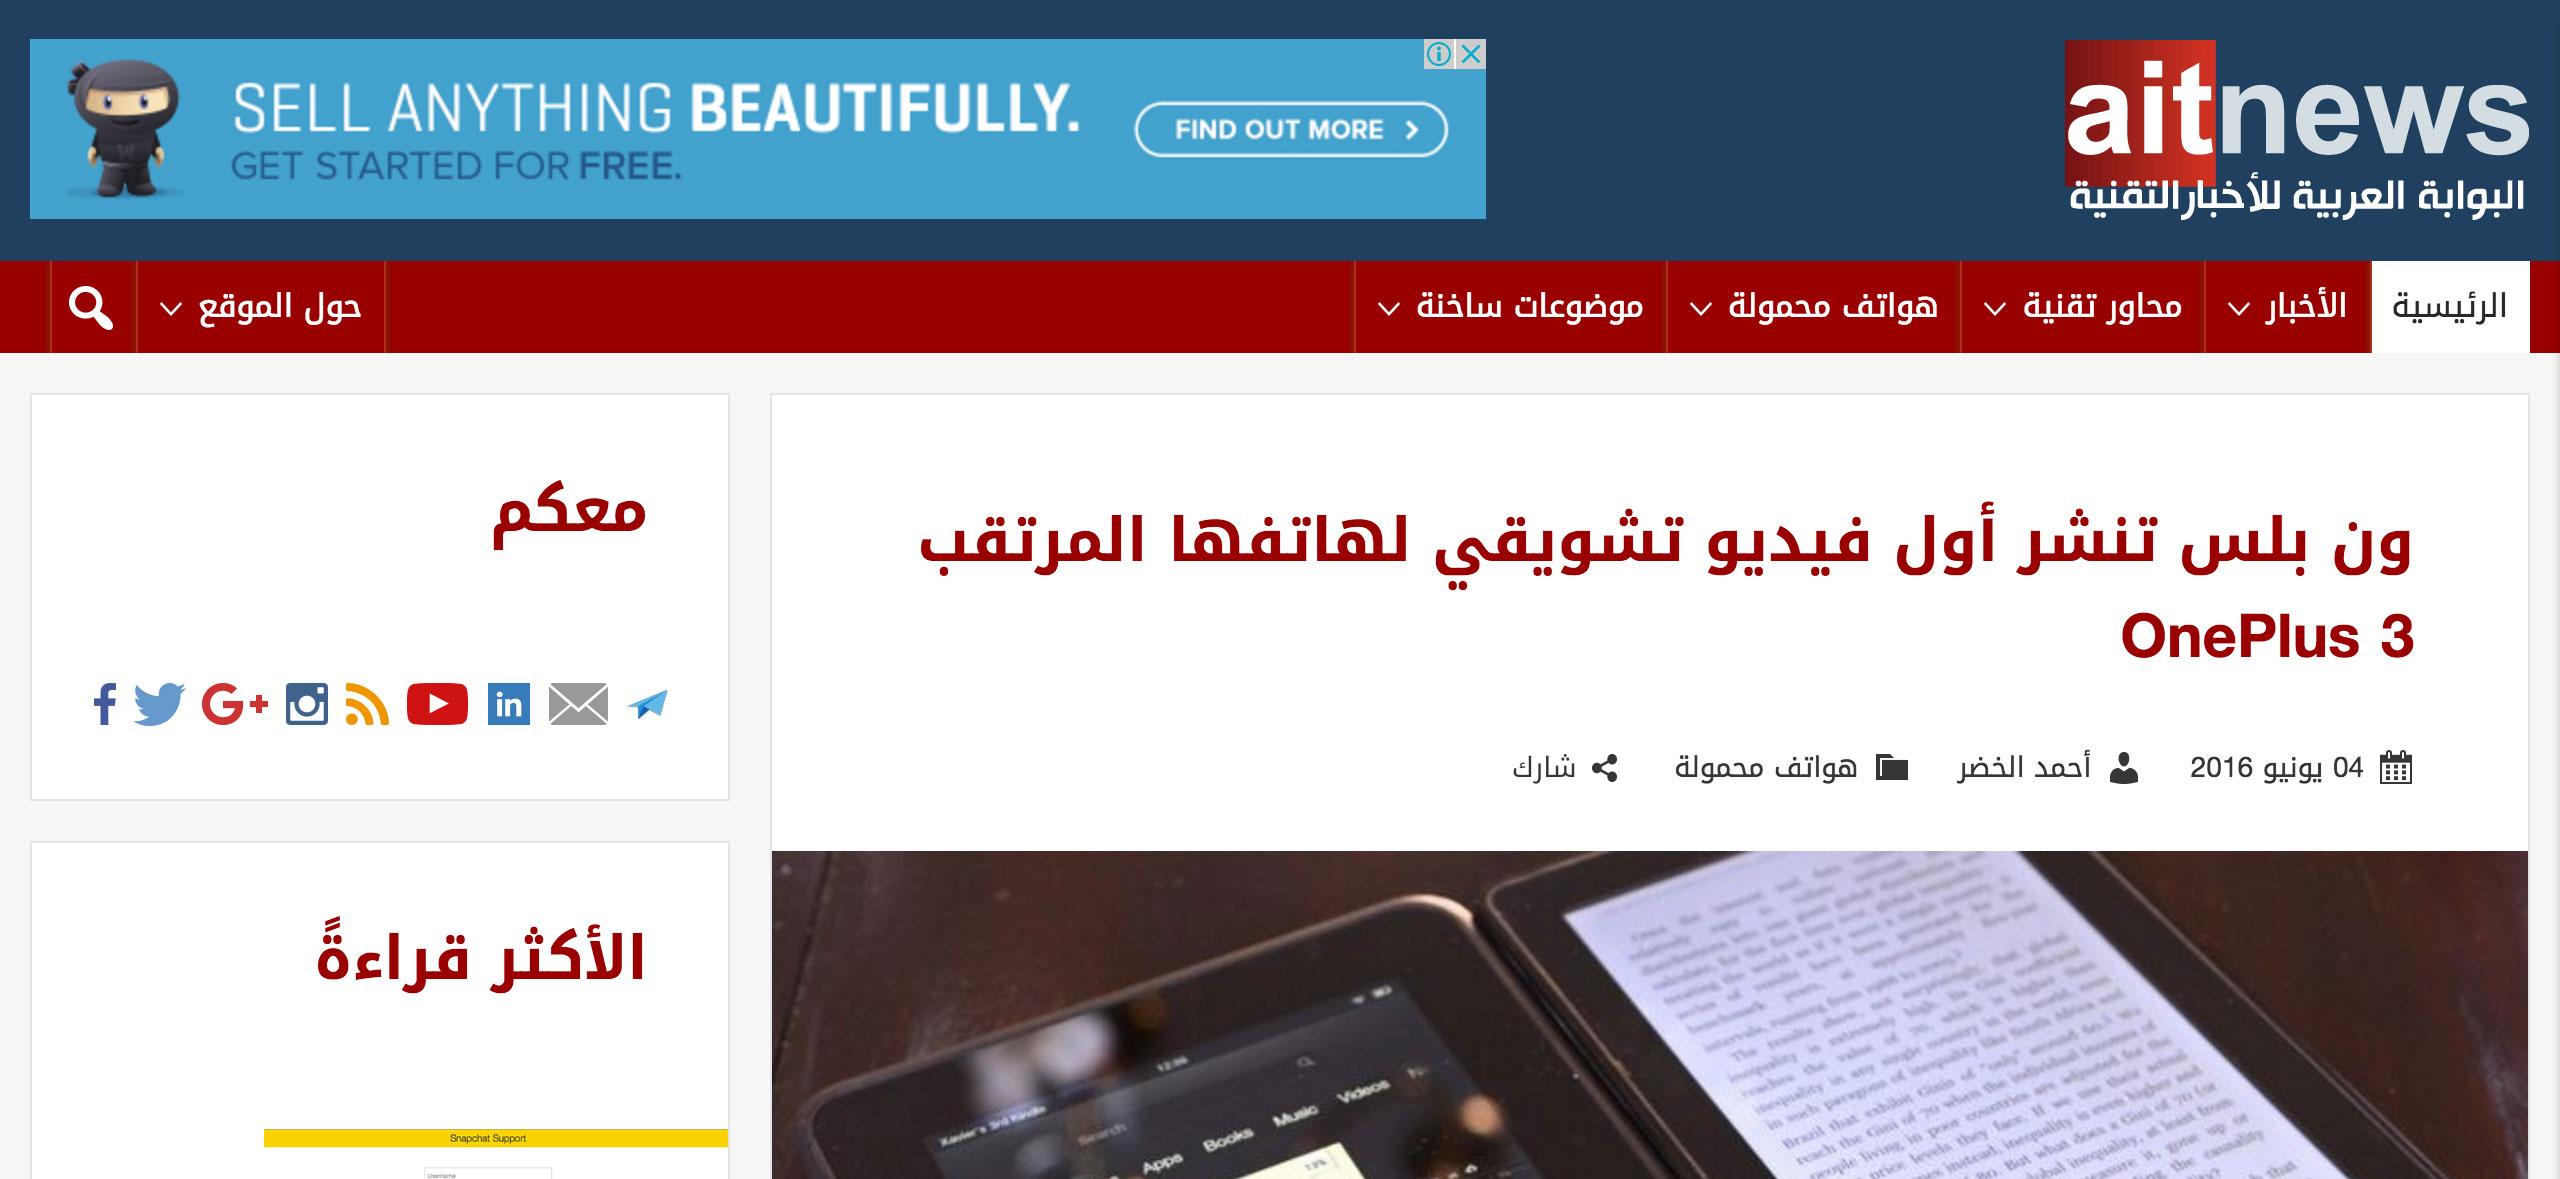 AitNews Website Design Developer